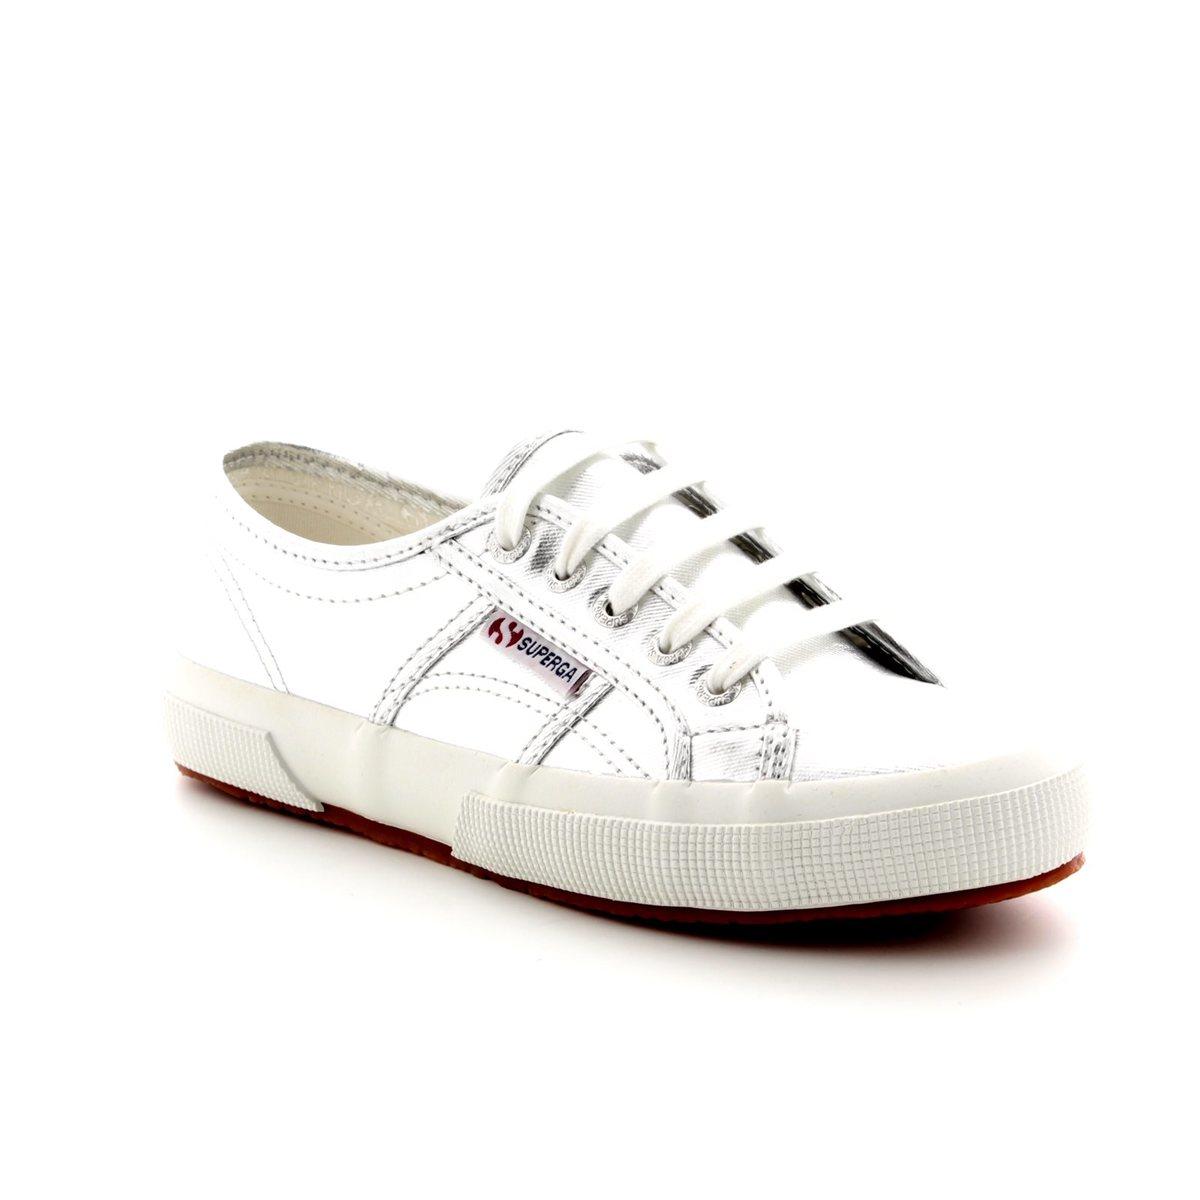 7e1012f87e2a Superga Trainers - Silver metallic - 2750 COTMETU Grey Silver S002HG0